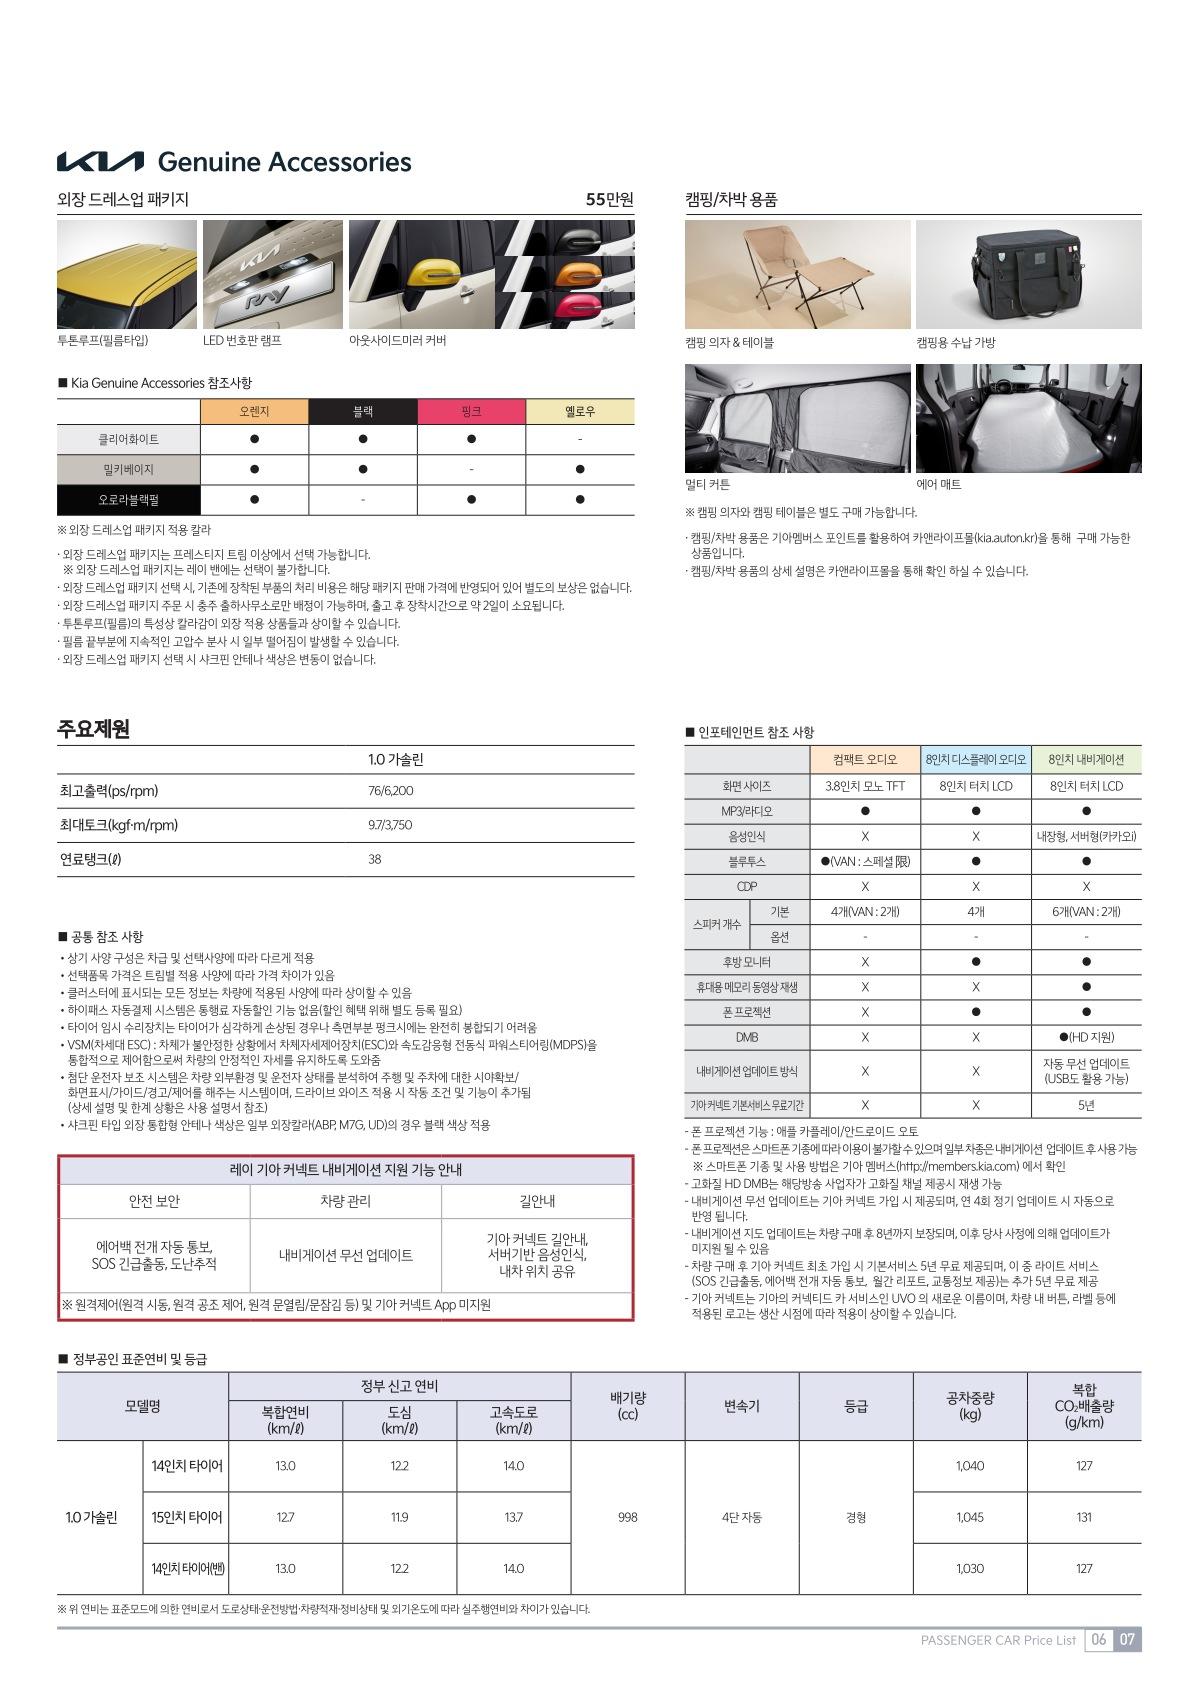 price_ray_03.jpg